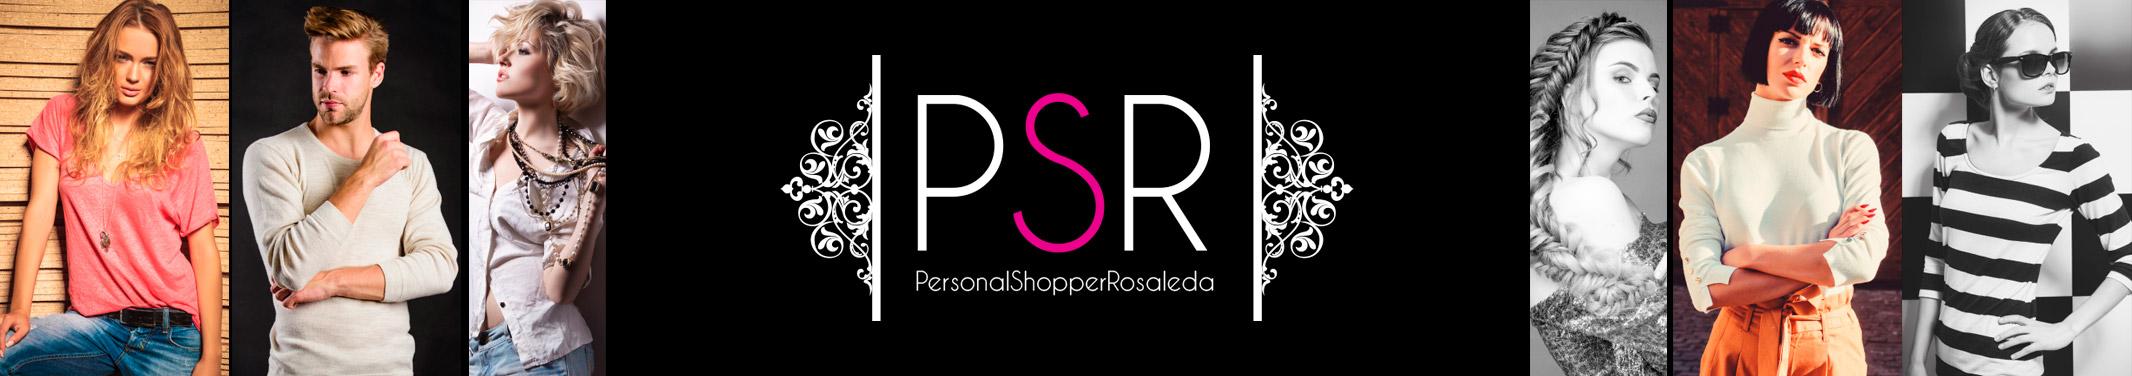 PERSONAL SHOPPER ROSALEDA CON ANA DE BEDOYA